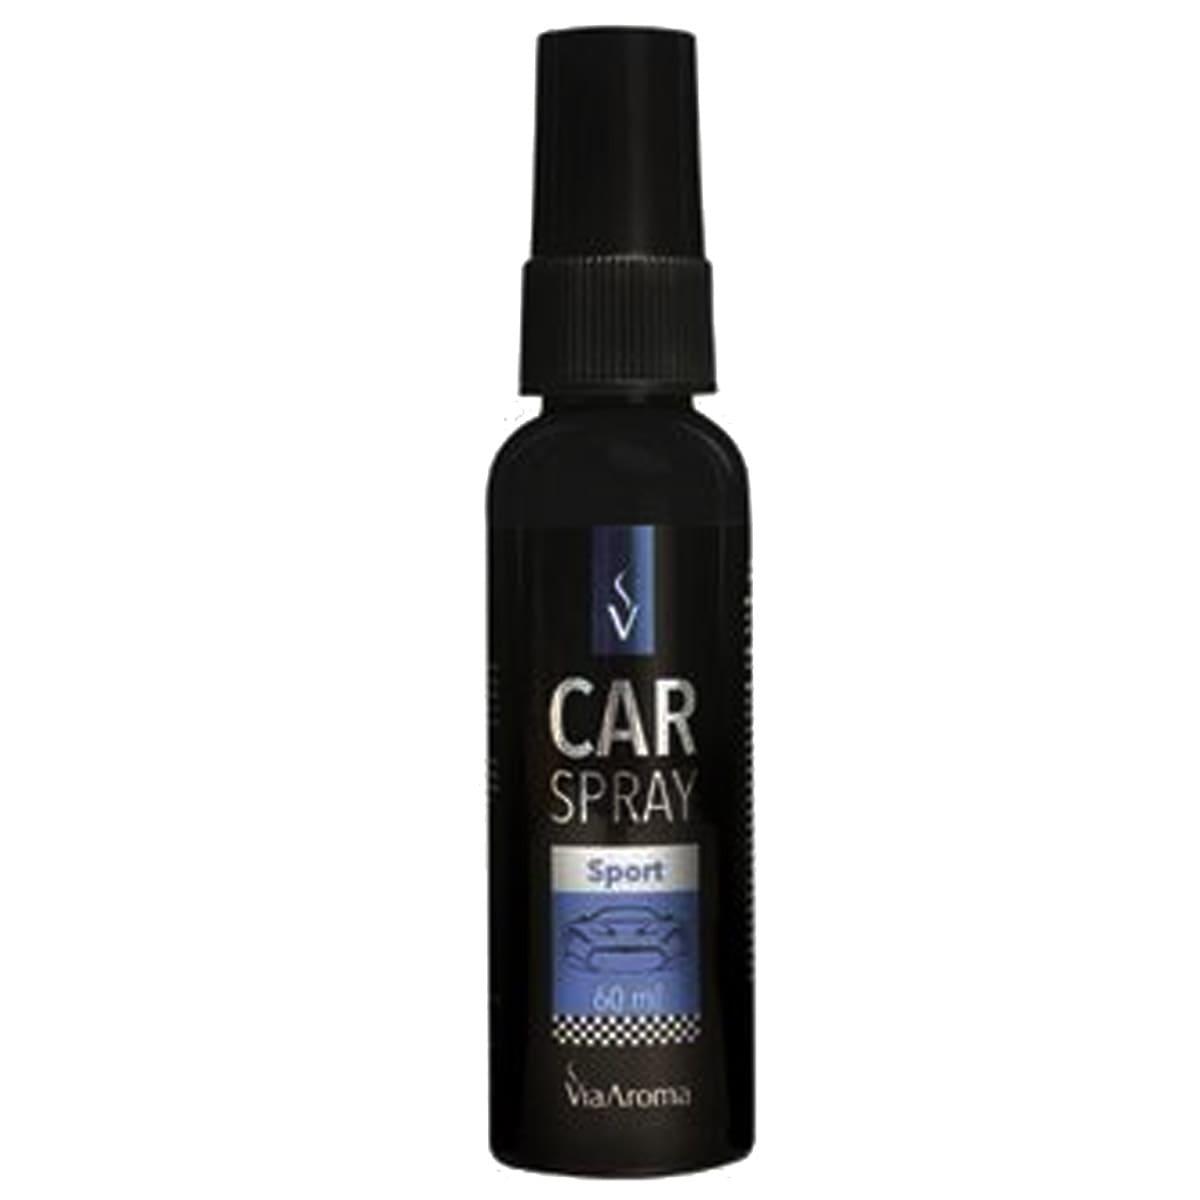 Car spray sport 60ml